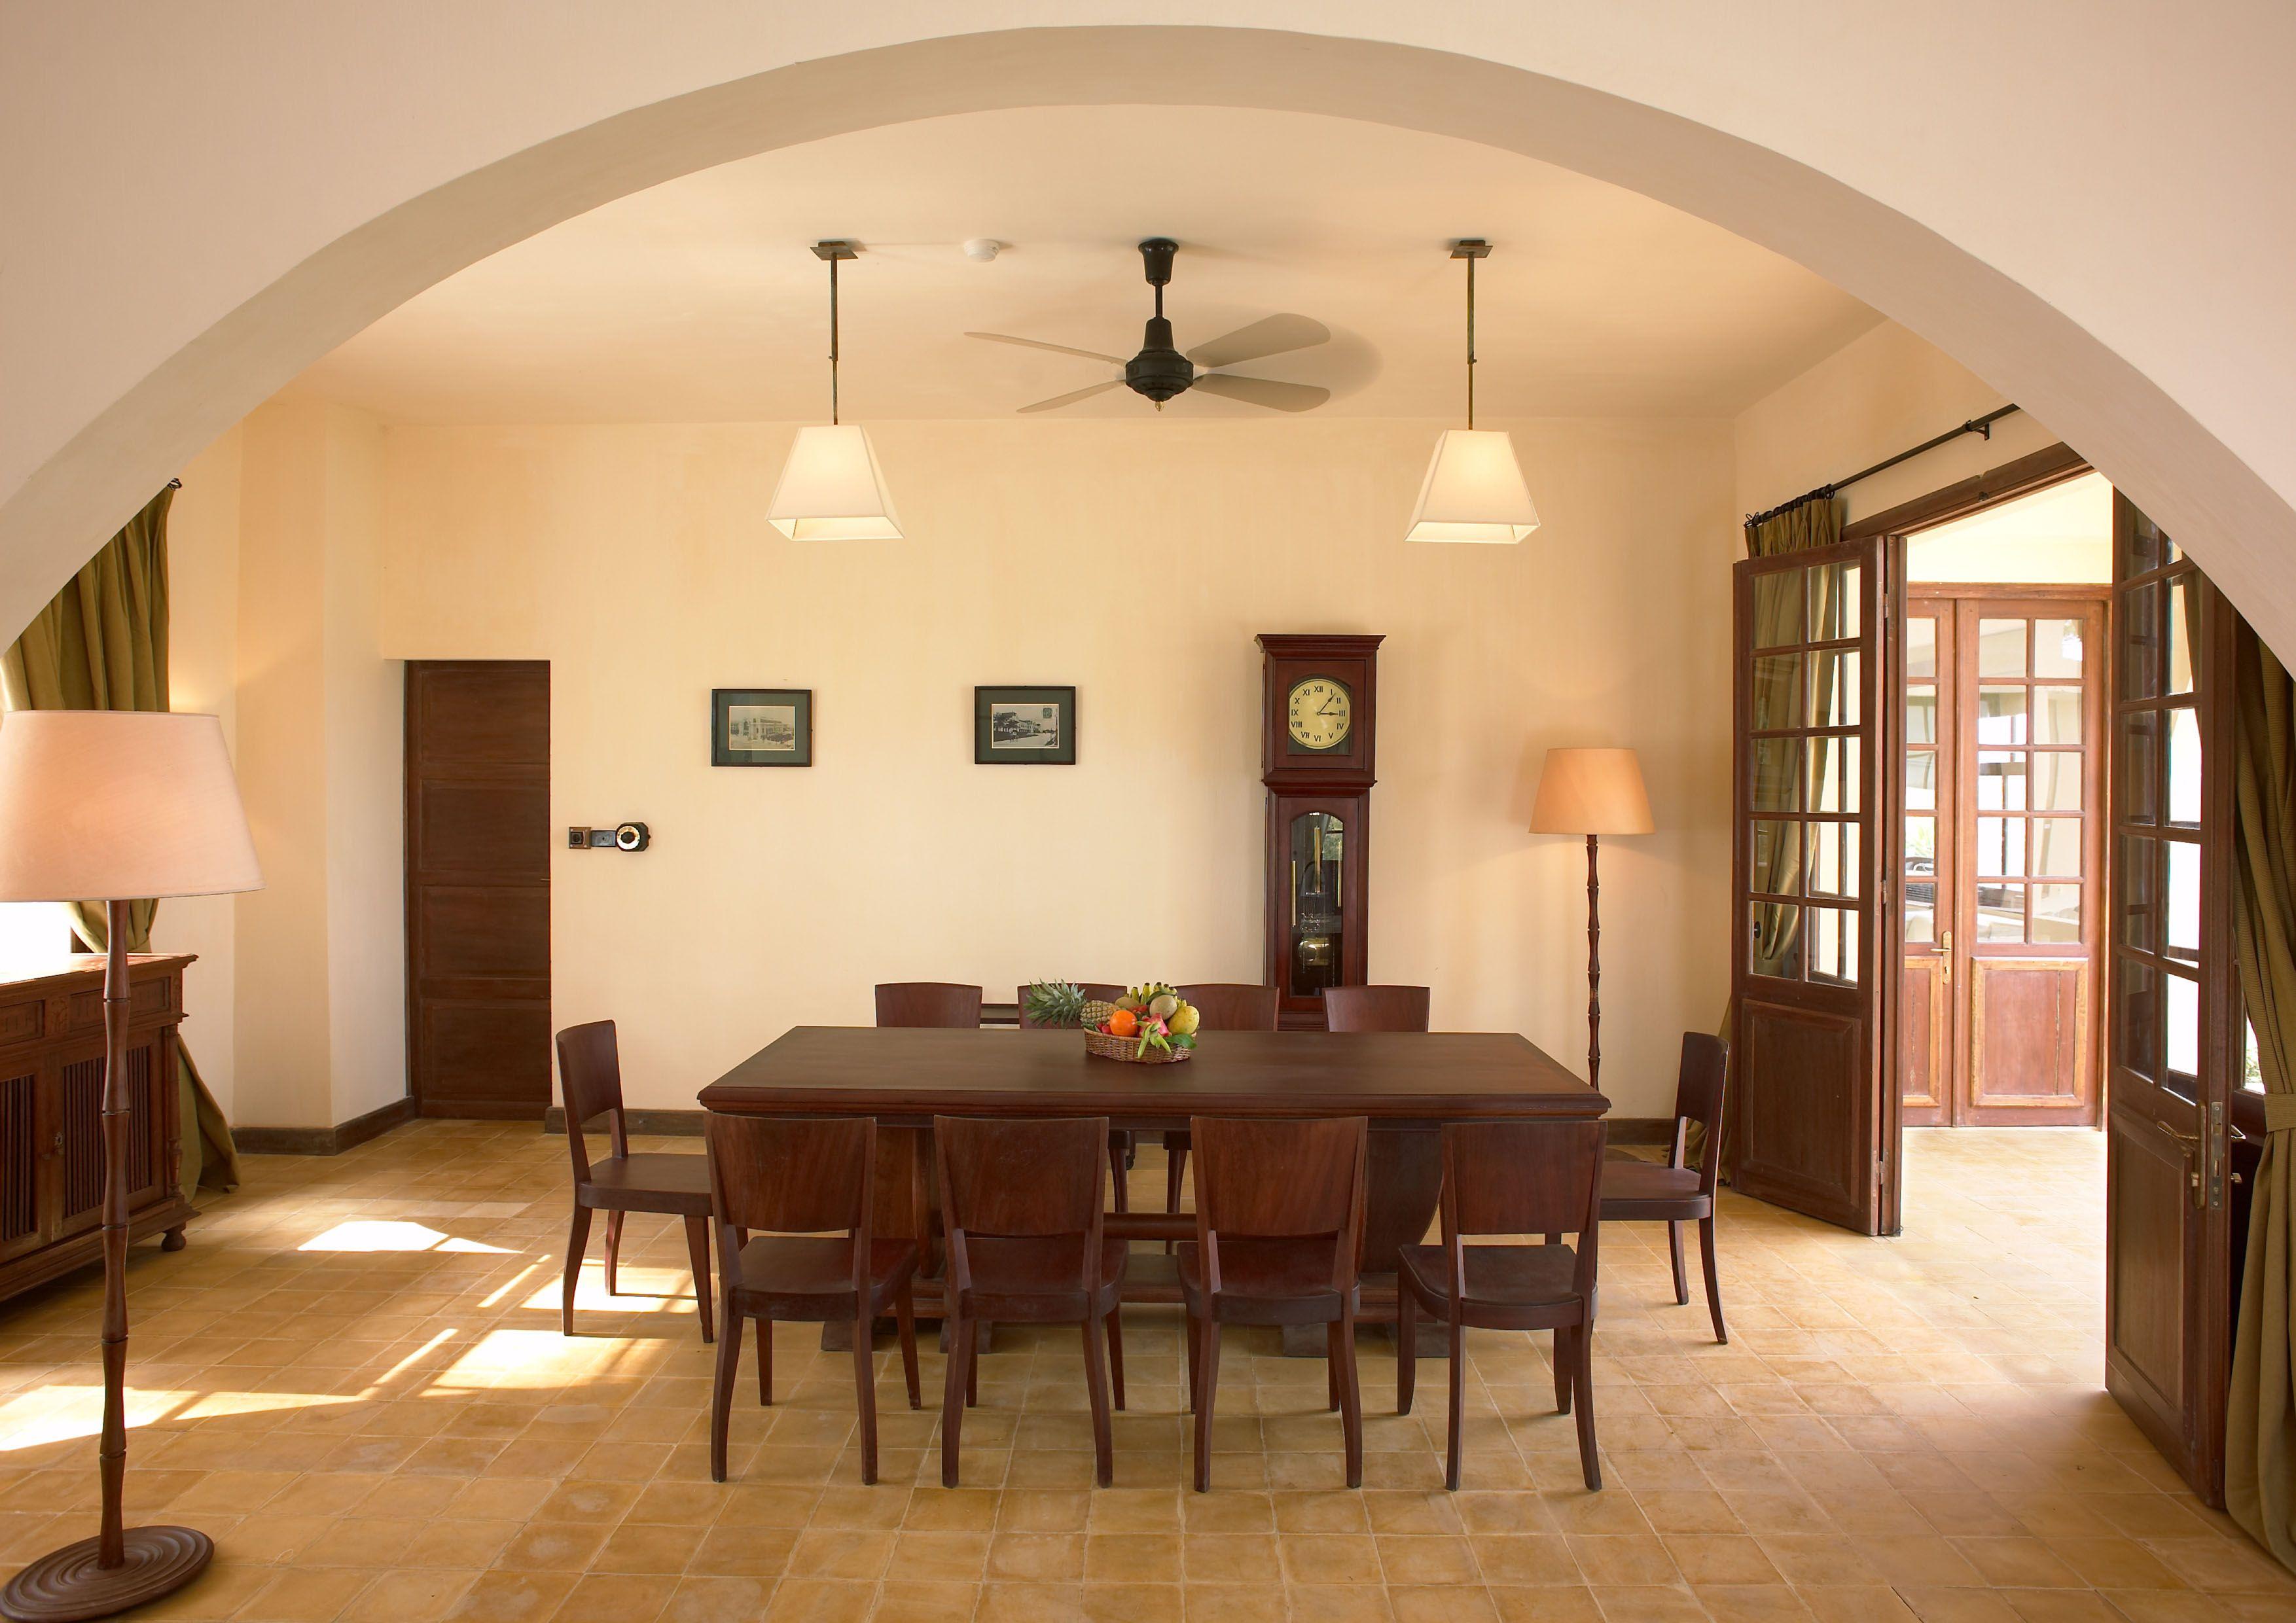 14 Amazing Living Room Designs Indian Style Interior And Decorating Ideas Interior Design Dining Room Dining Room Interiors Luxury Dining Room